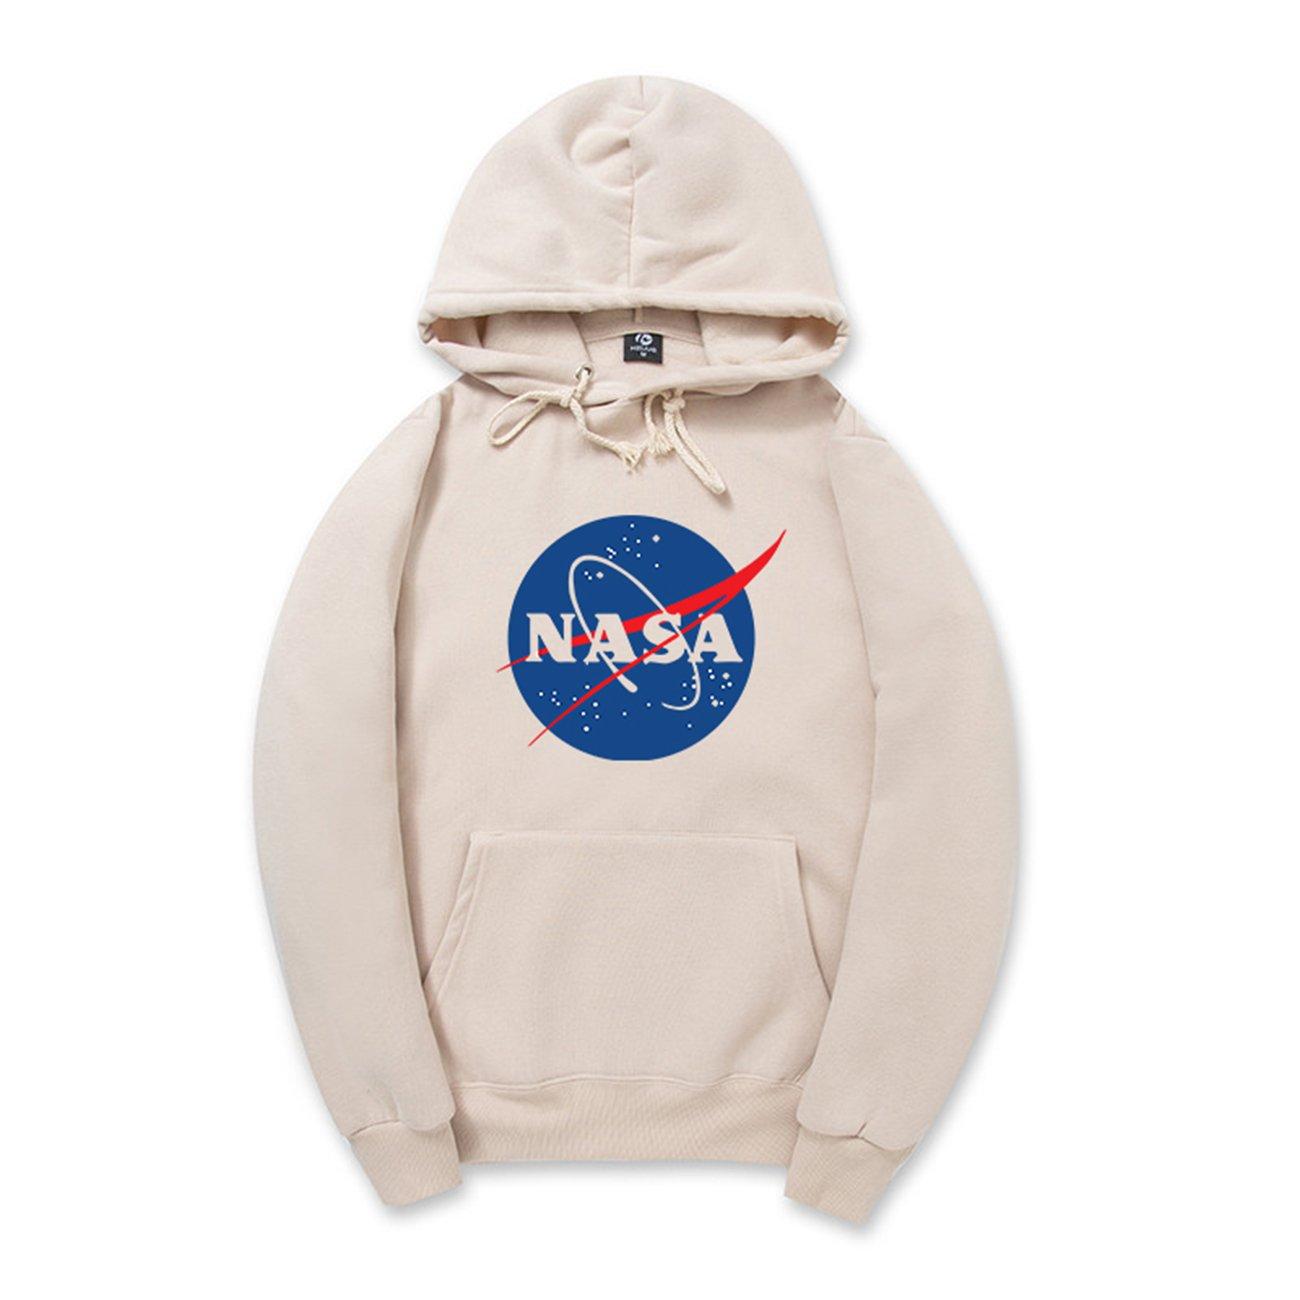 CORIRESHA Fashion NASA Logo Print Hoodie Sweatshirt with Pocket